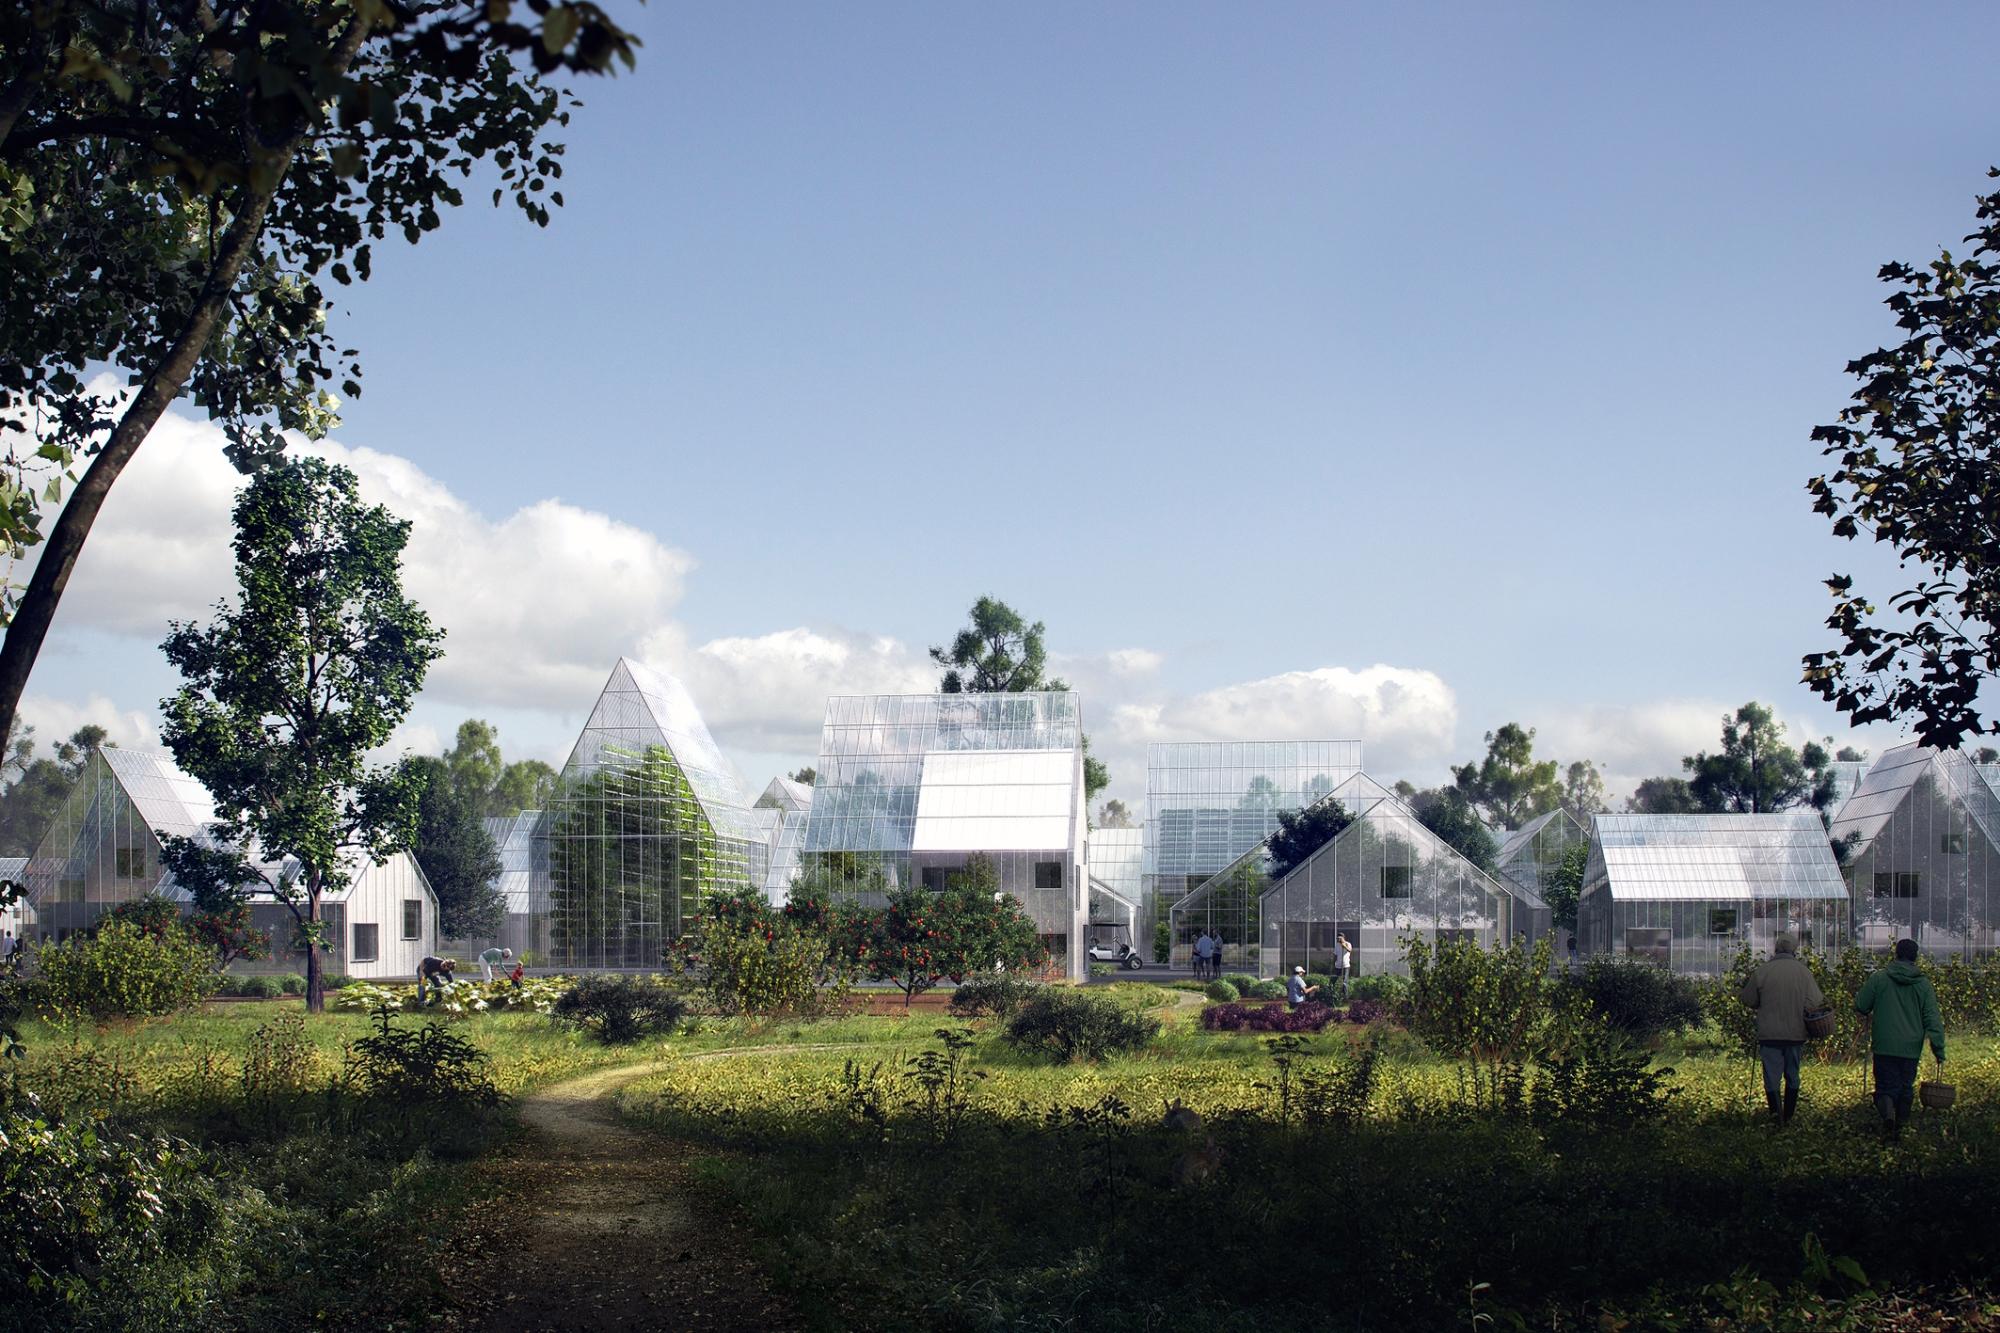 regen-villages-dorf-der-zukunft-energy-ag